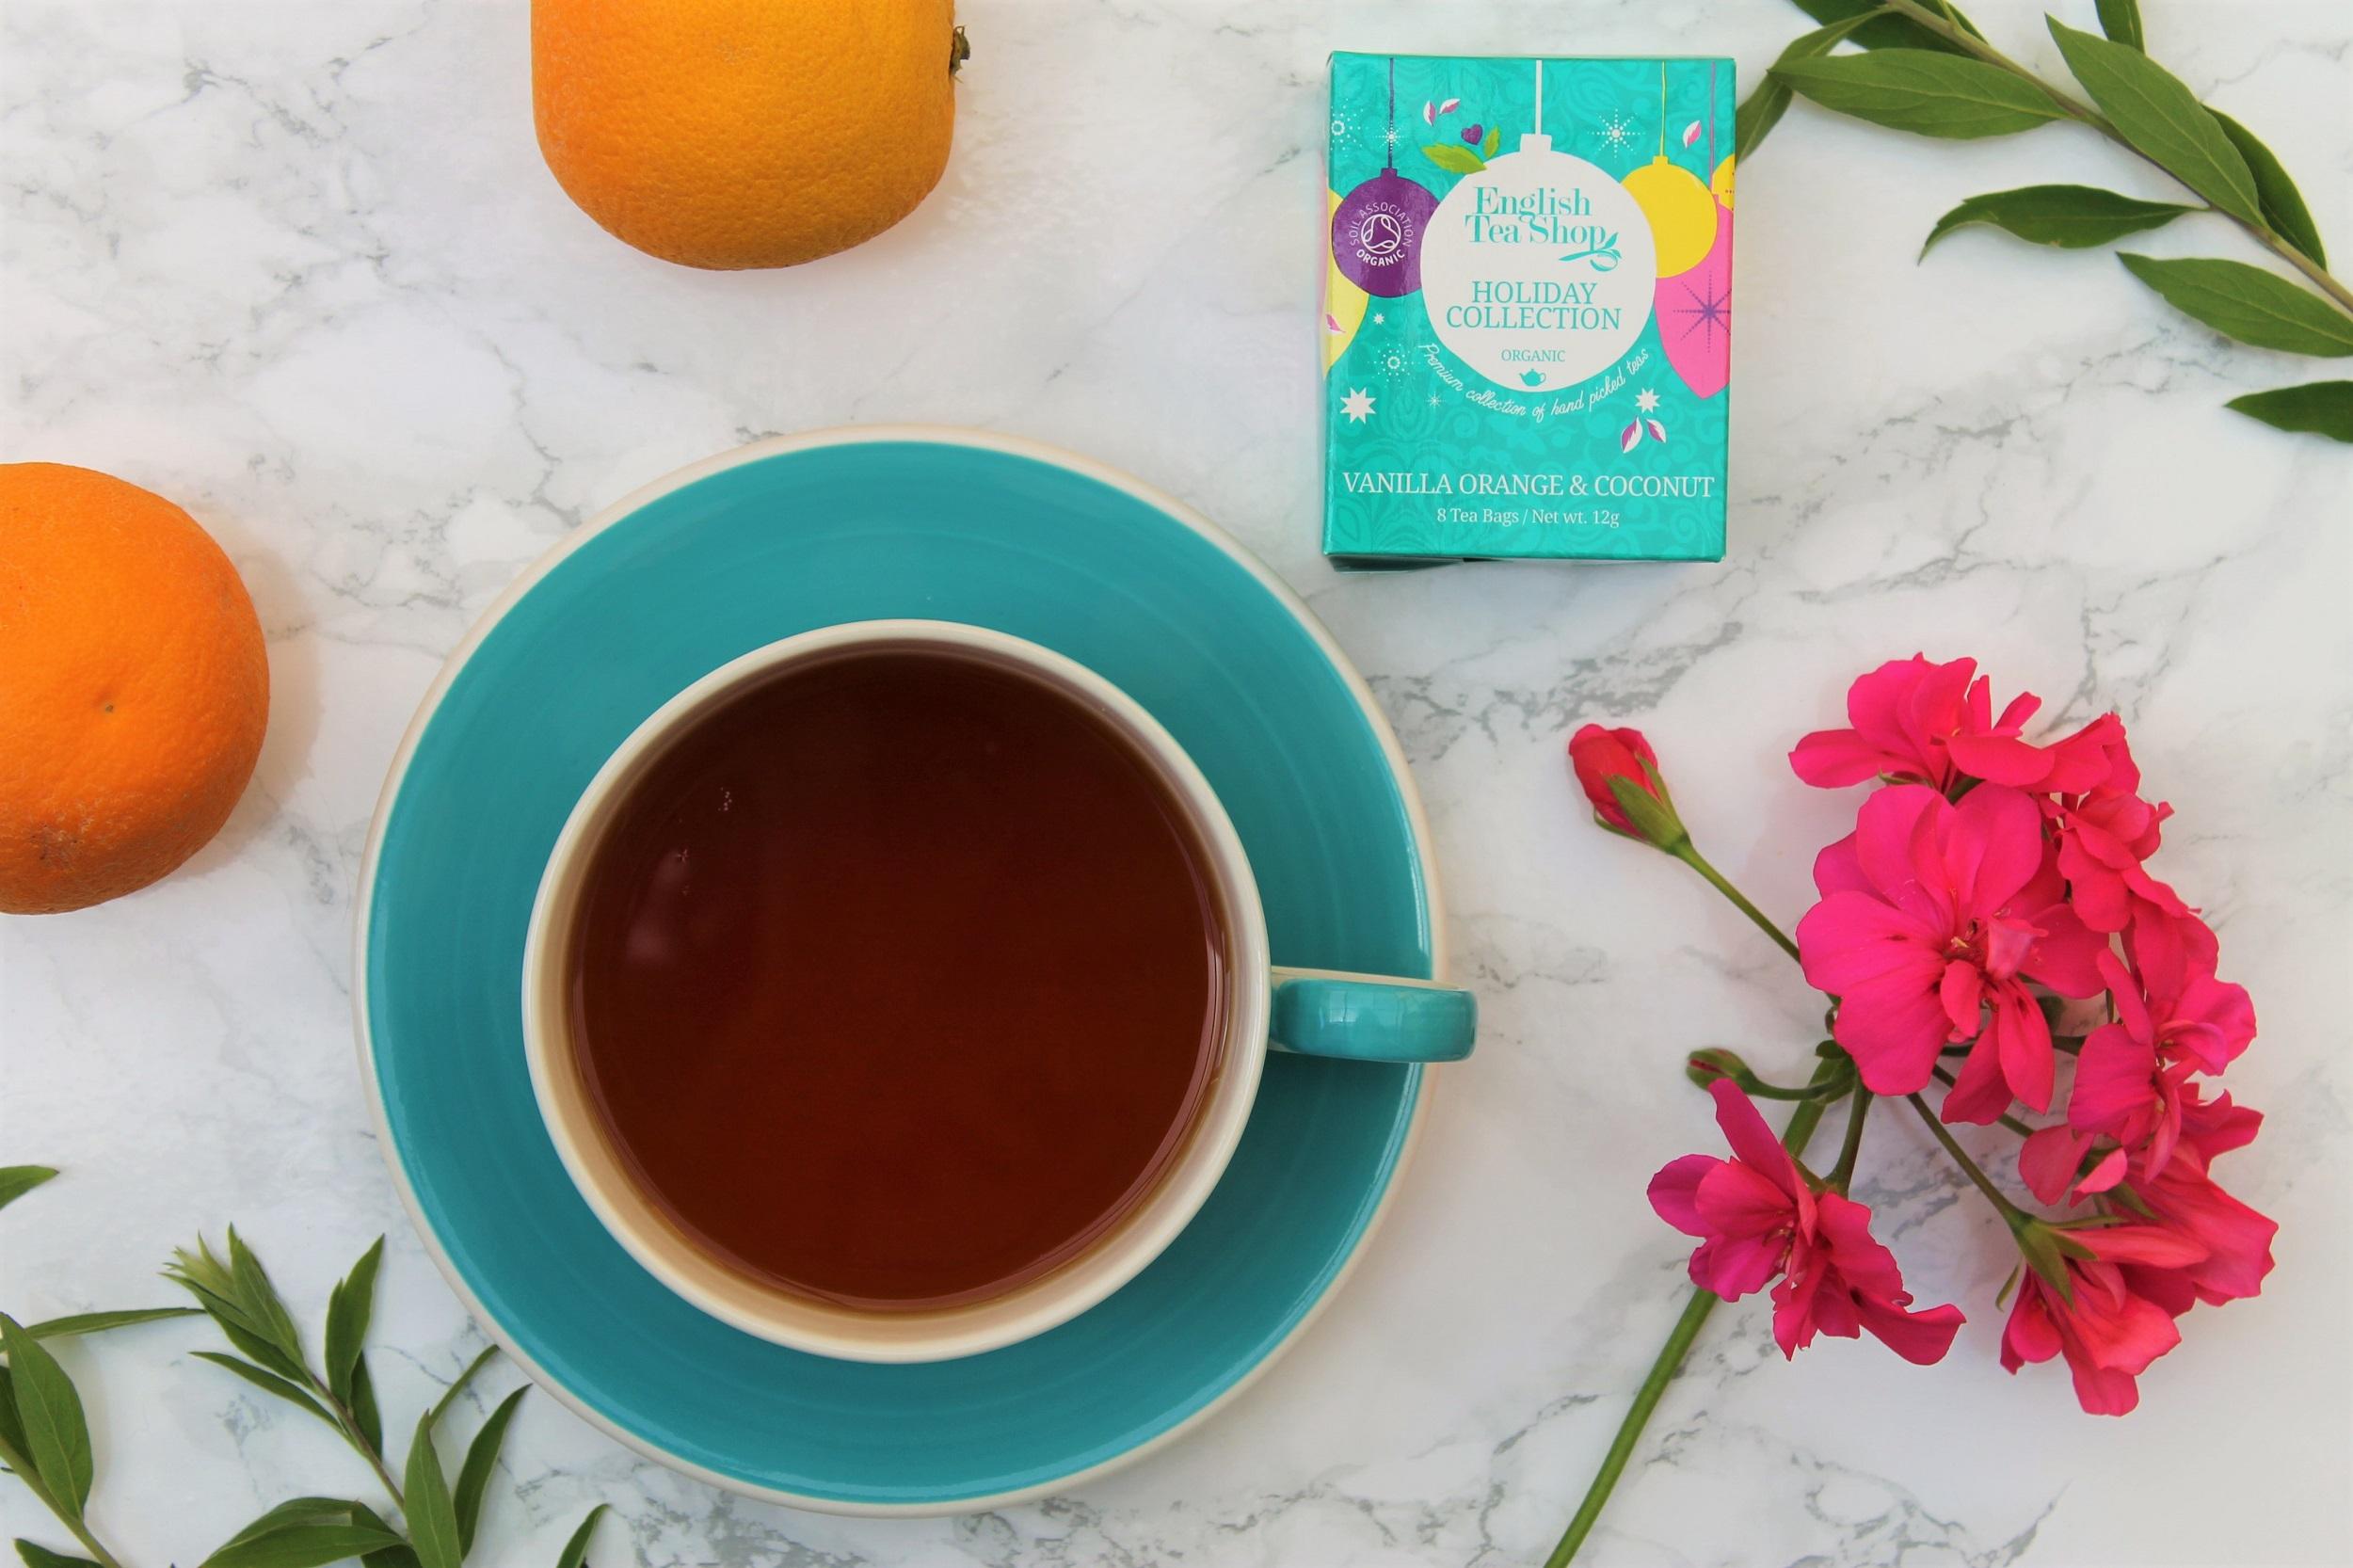 English Tea Shop Vanilla Orange & Coconut Tea Review